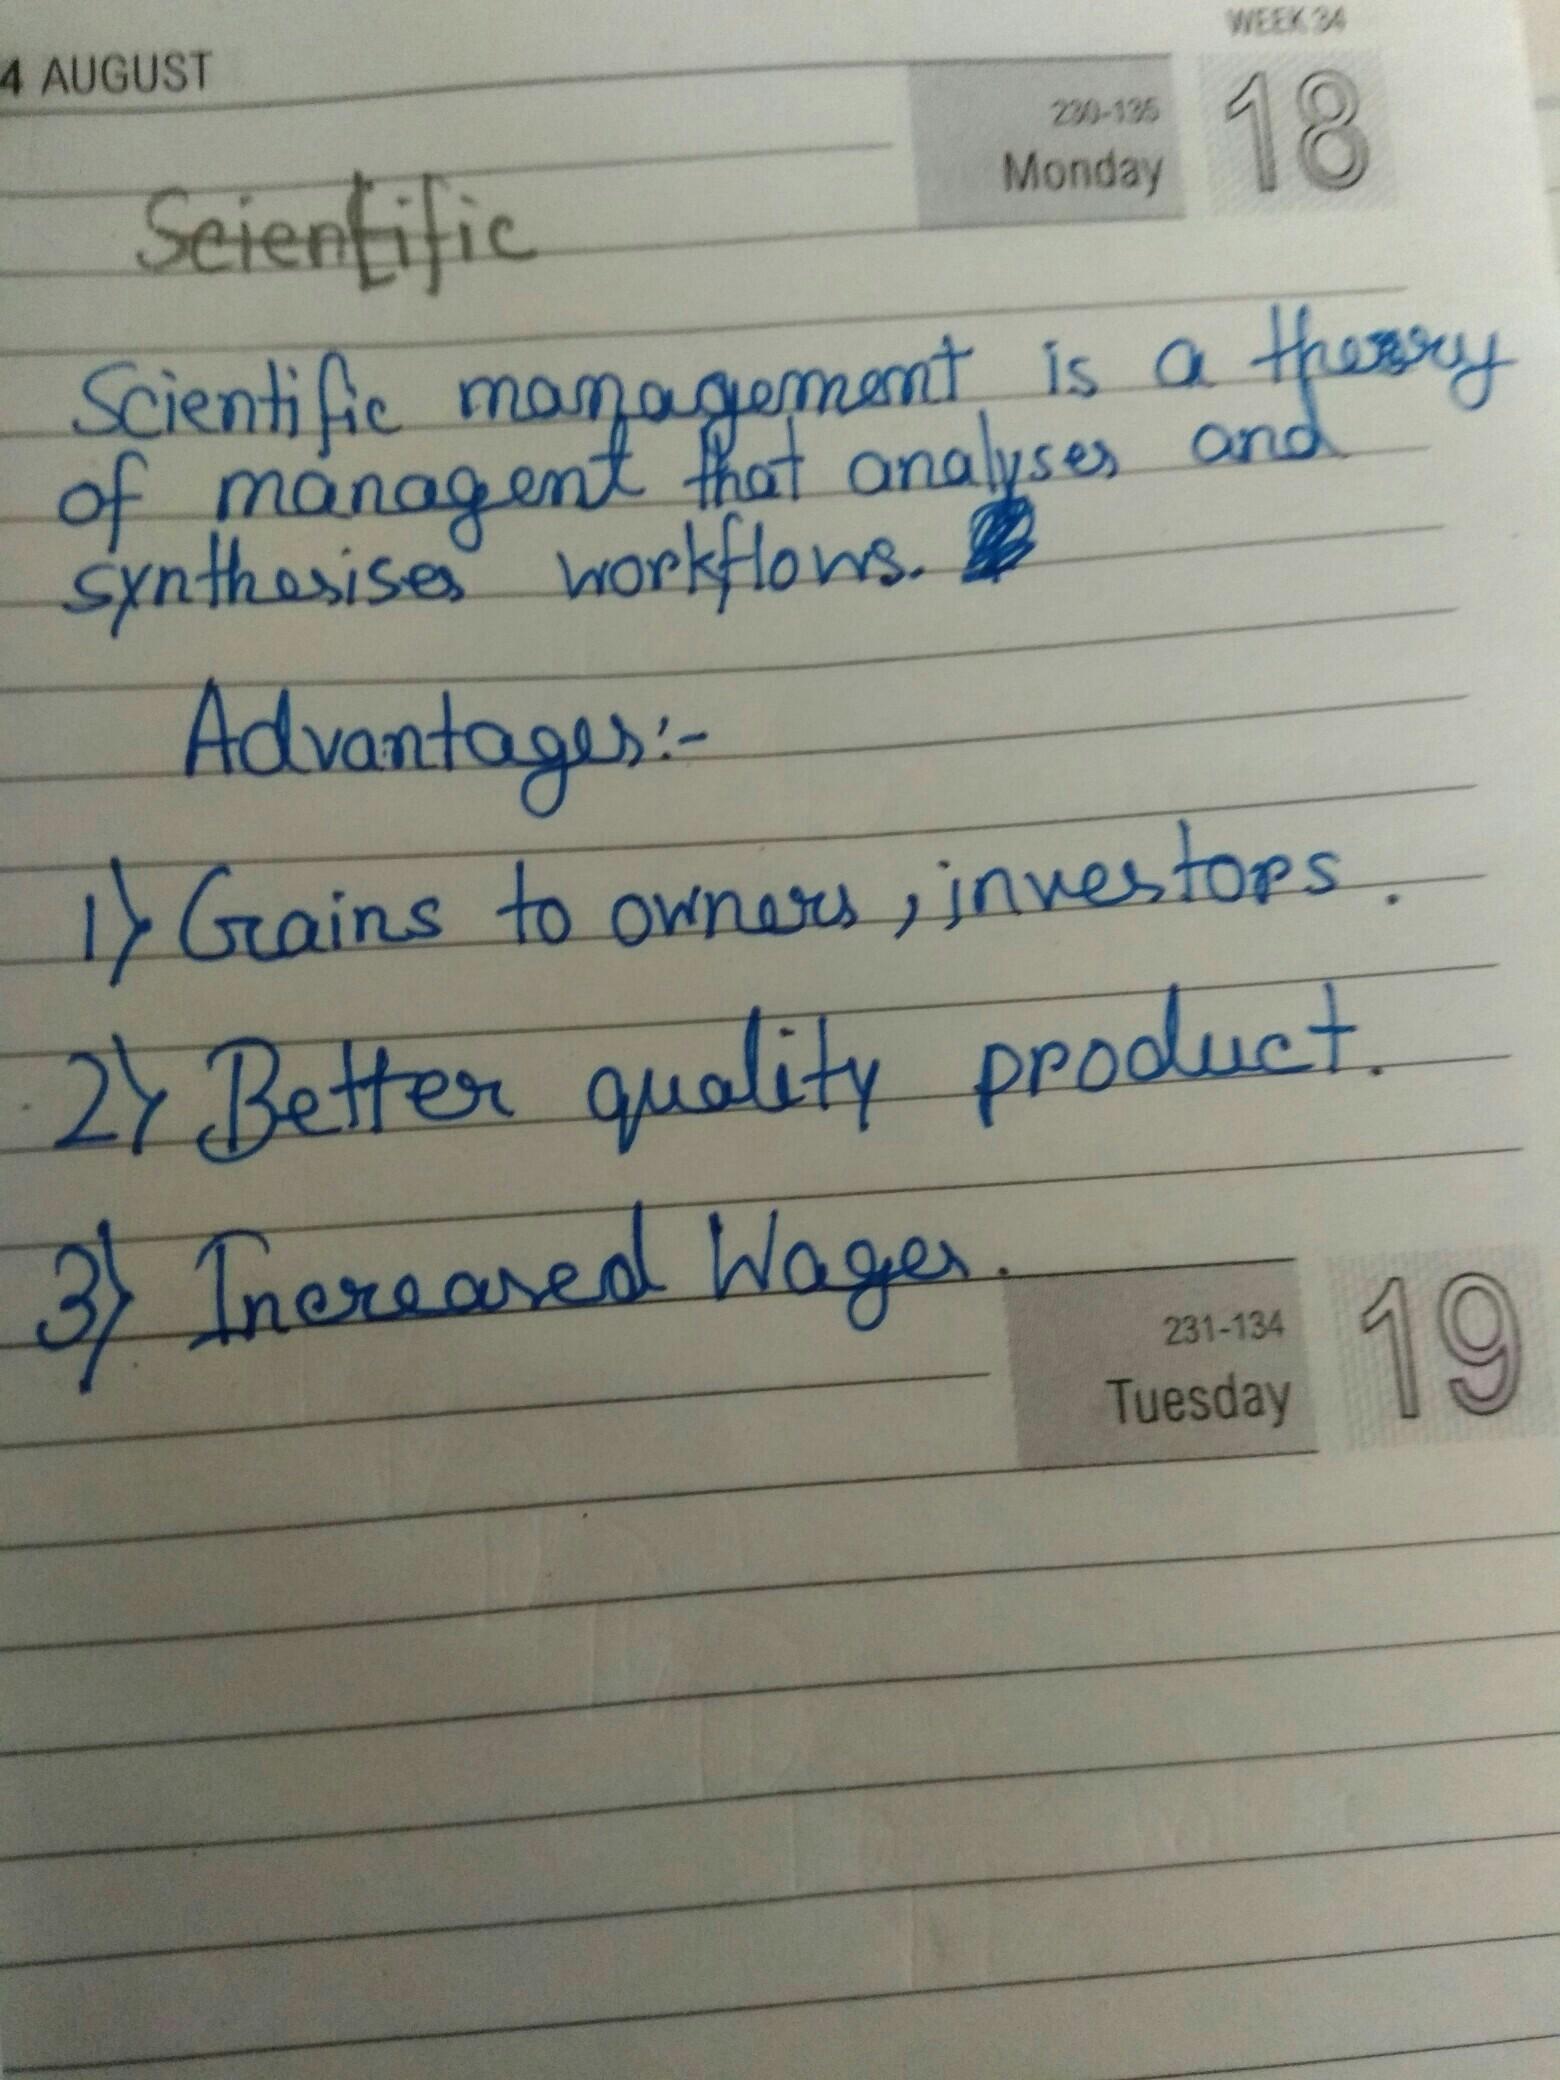 management science definition